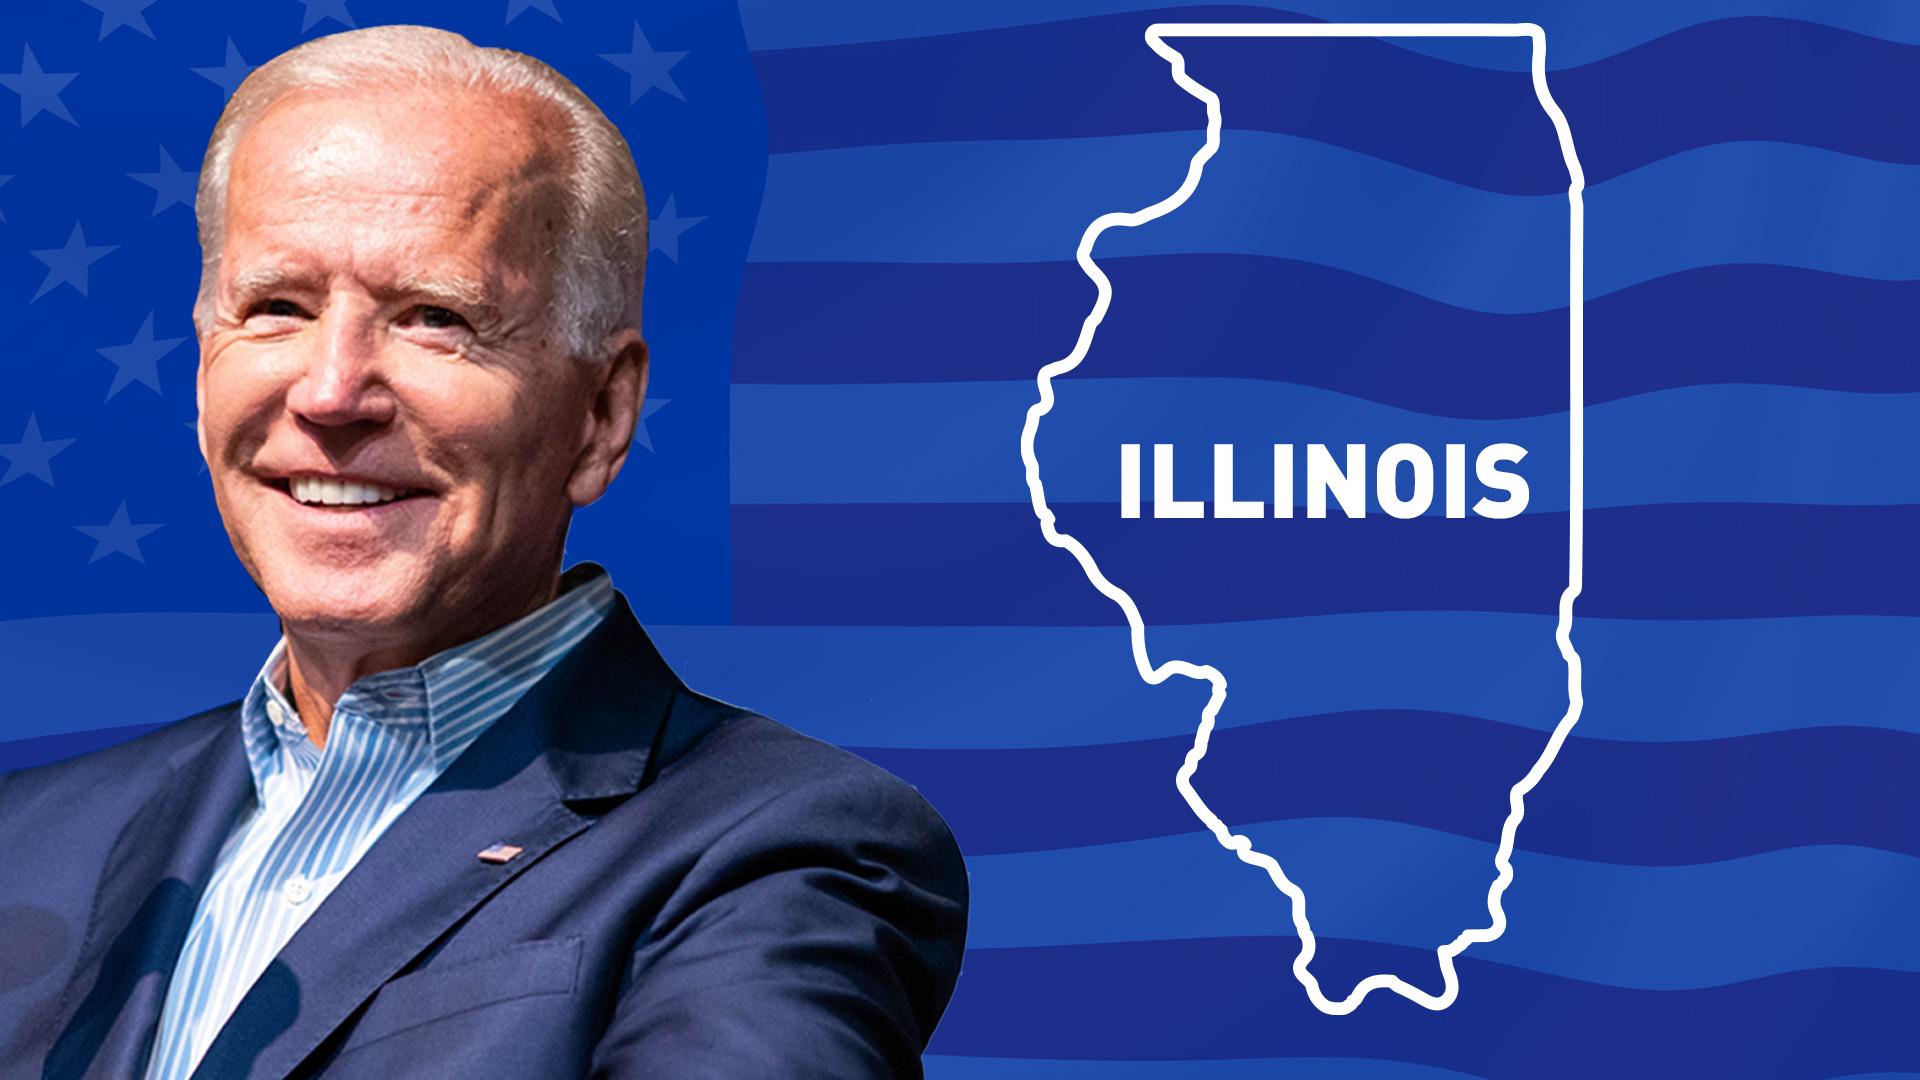 IMAGEM: Biden vence no Illinois